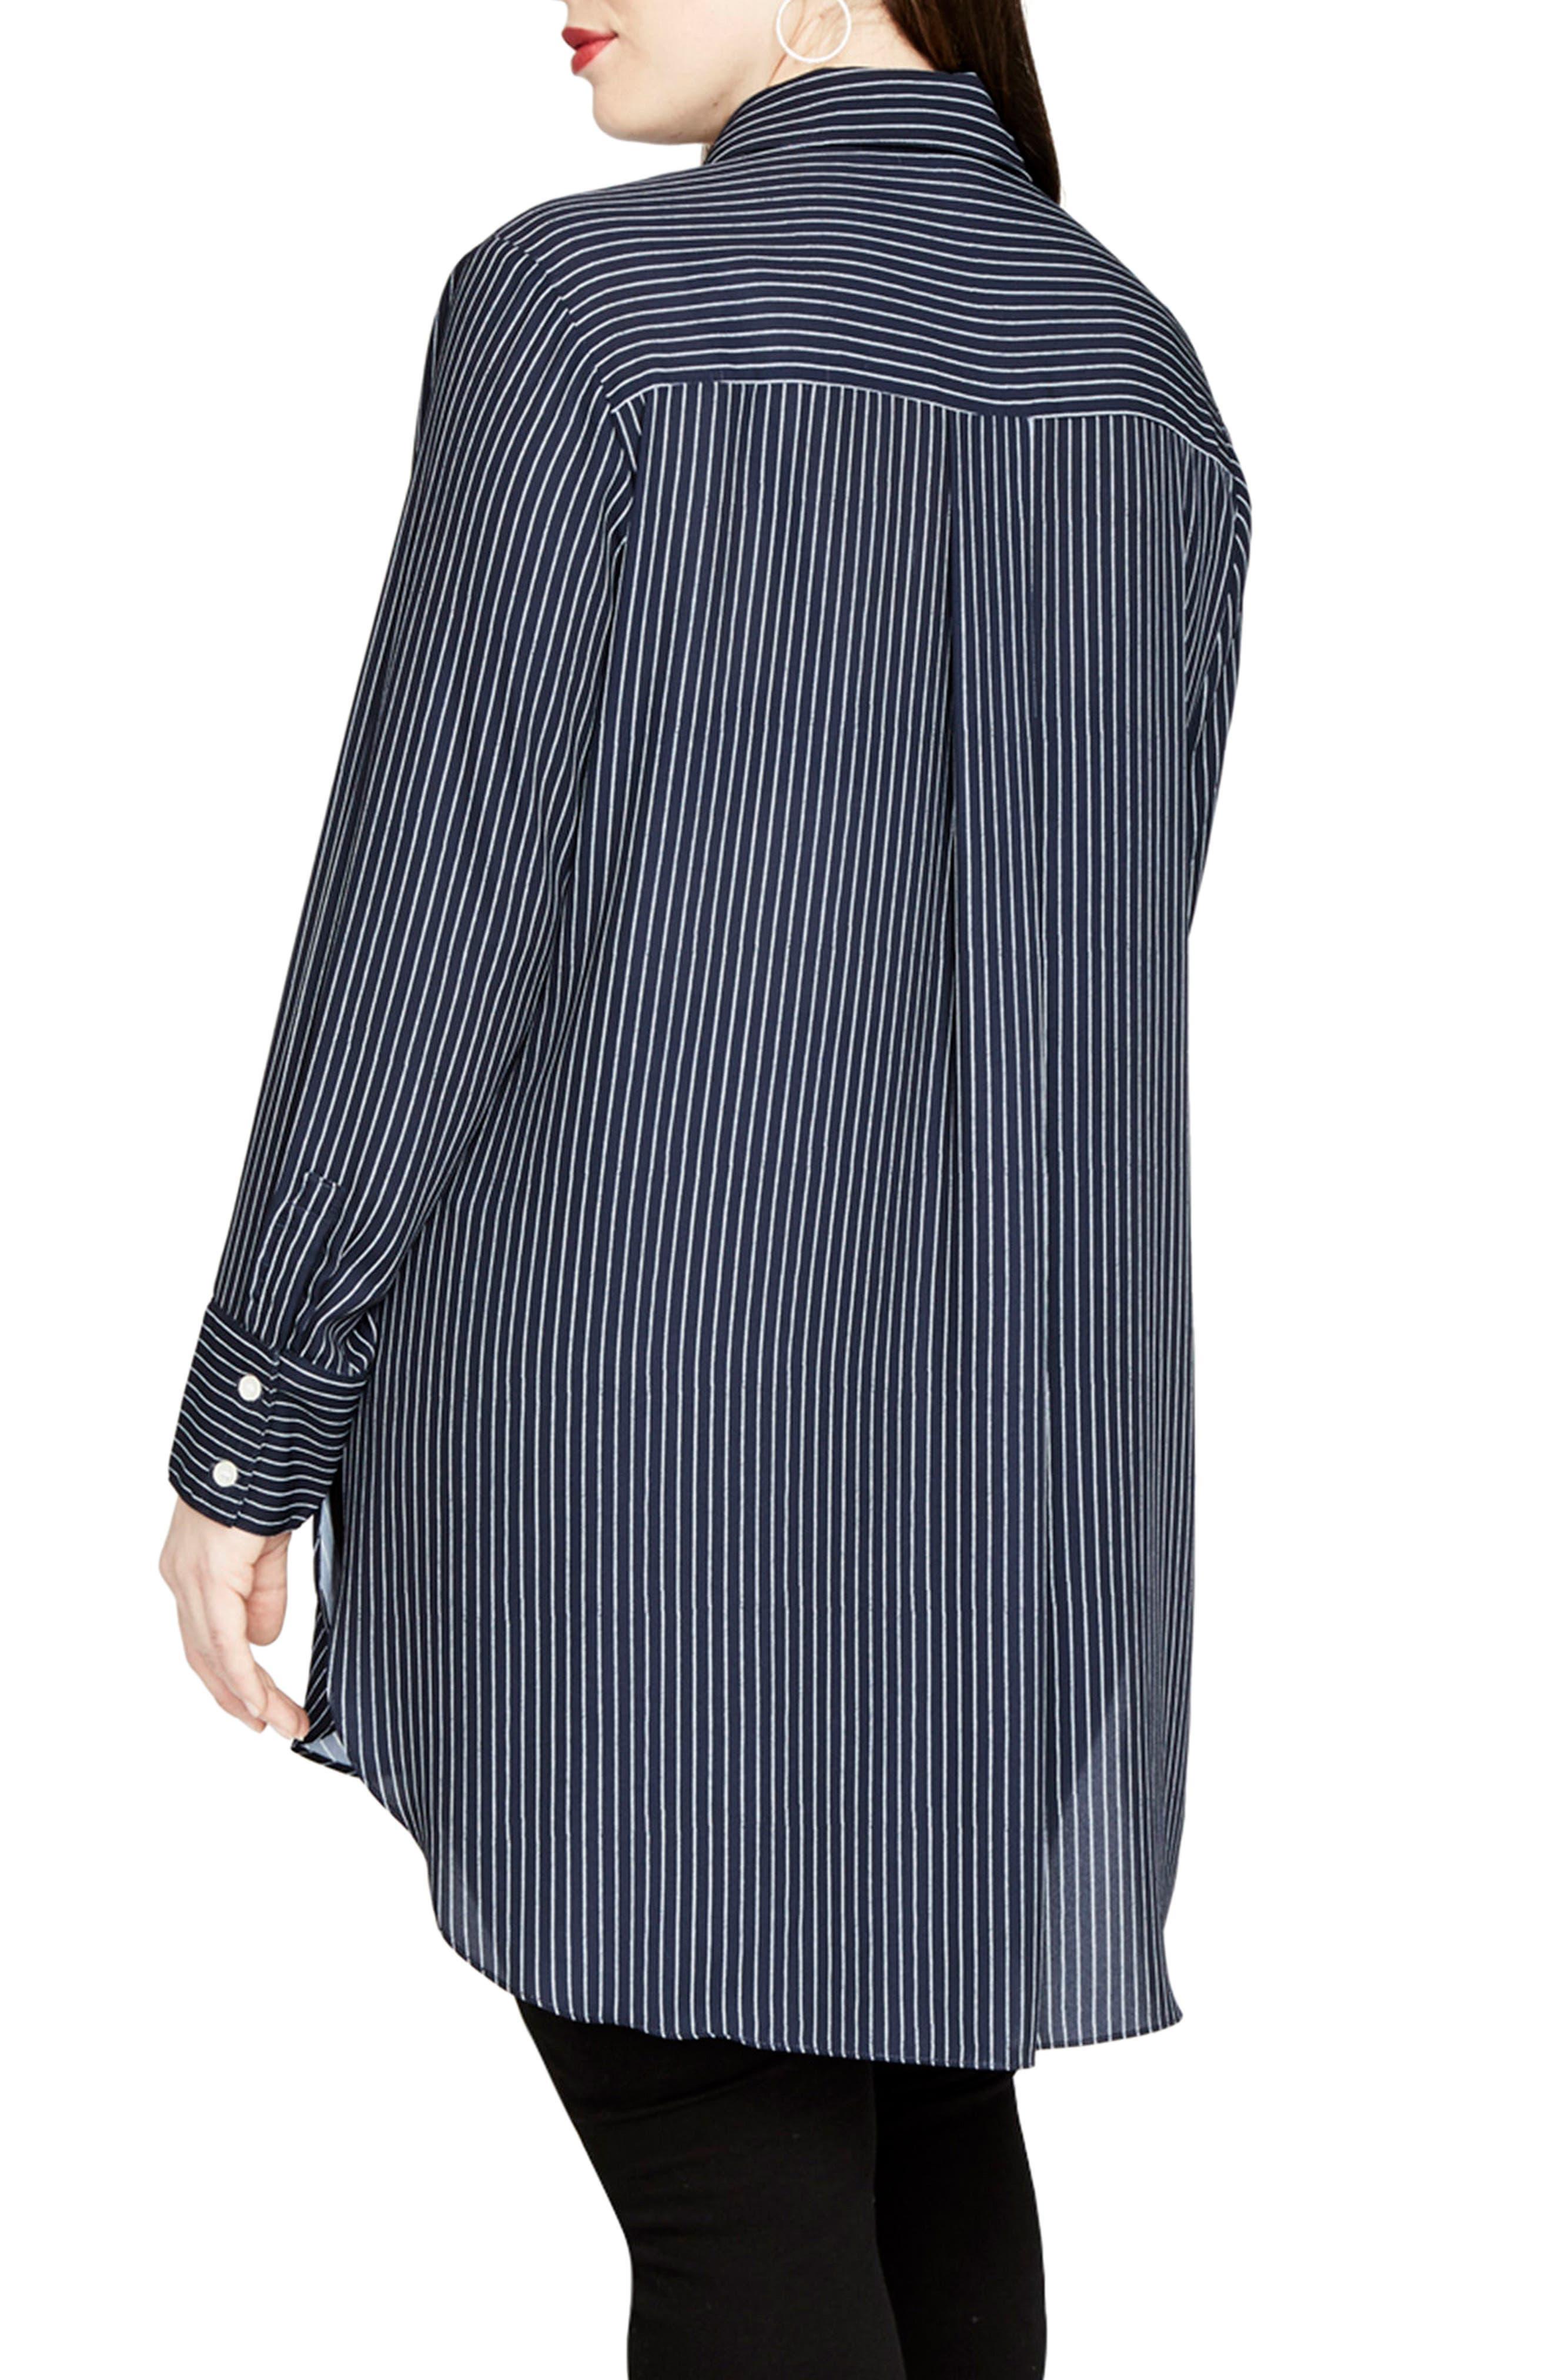 High/Low Pinstripe Shirt,                             Alternate thumbnail 2, color,                             Navy Combo